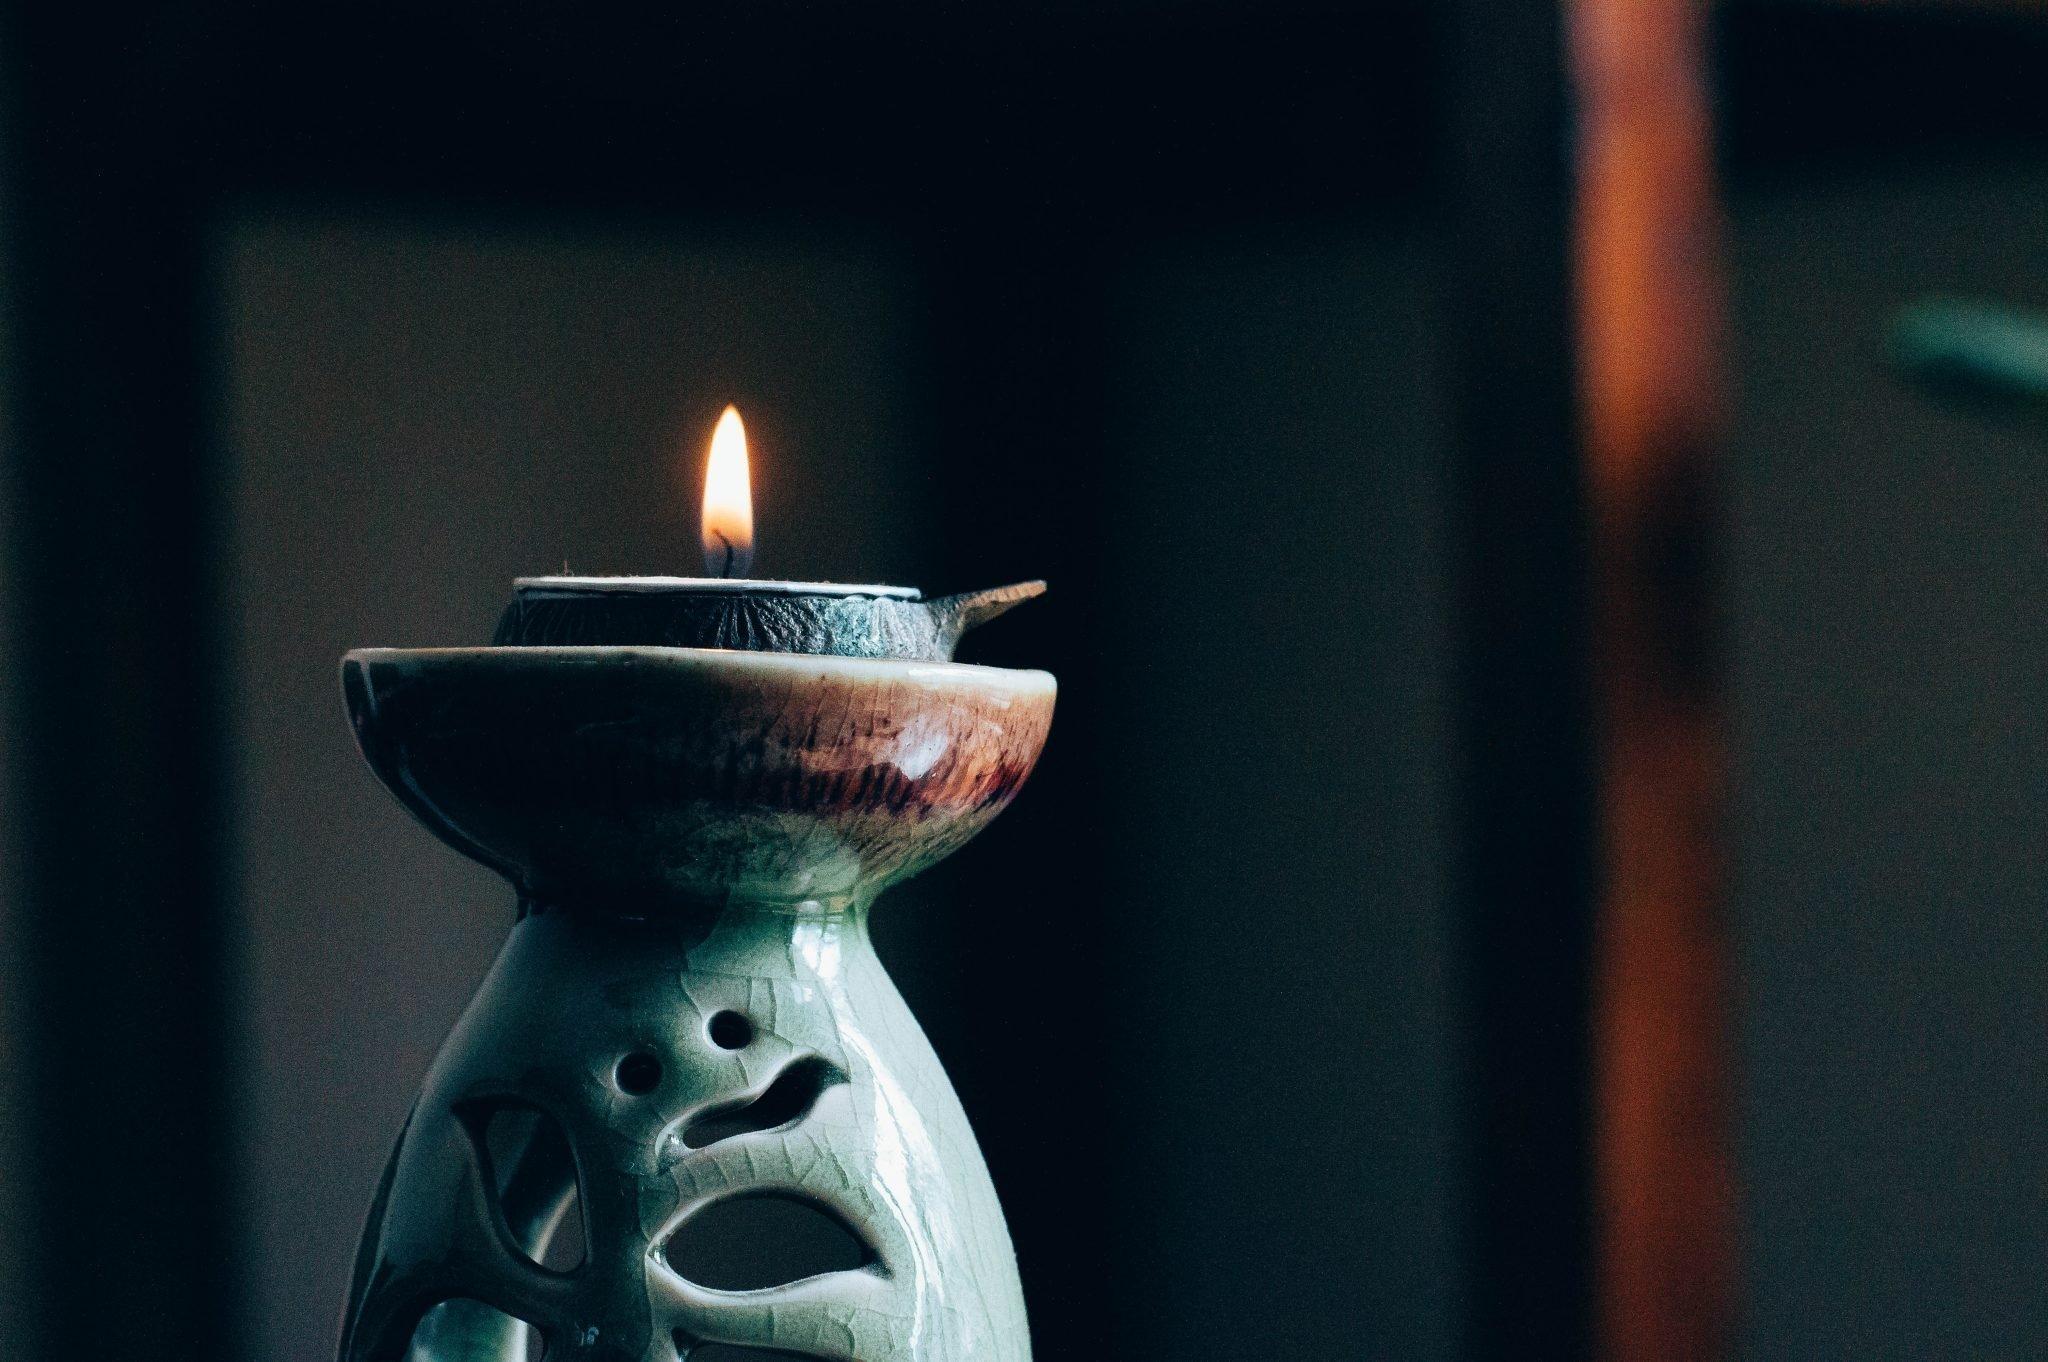 Urban Zen: Mindful Yin Yoga, Reiki, and Breath Work with Leah Adams